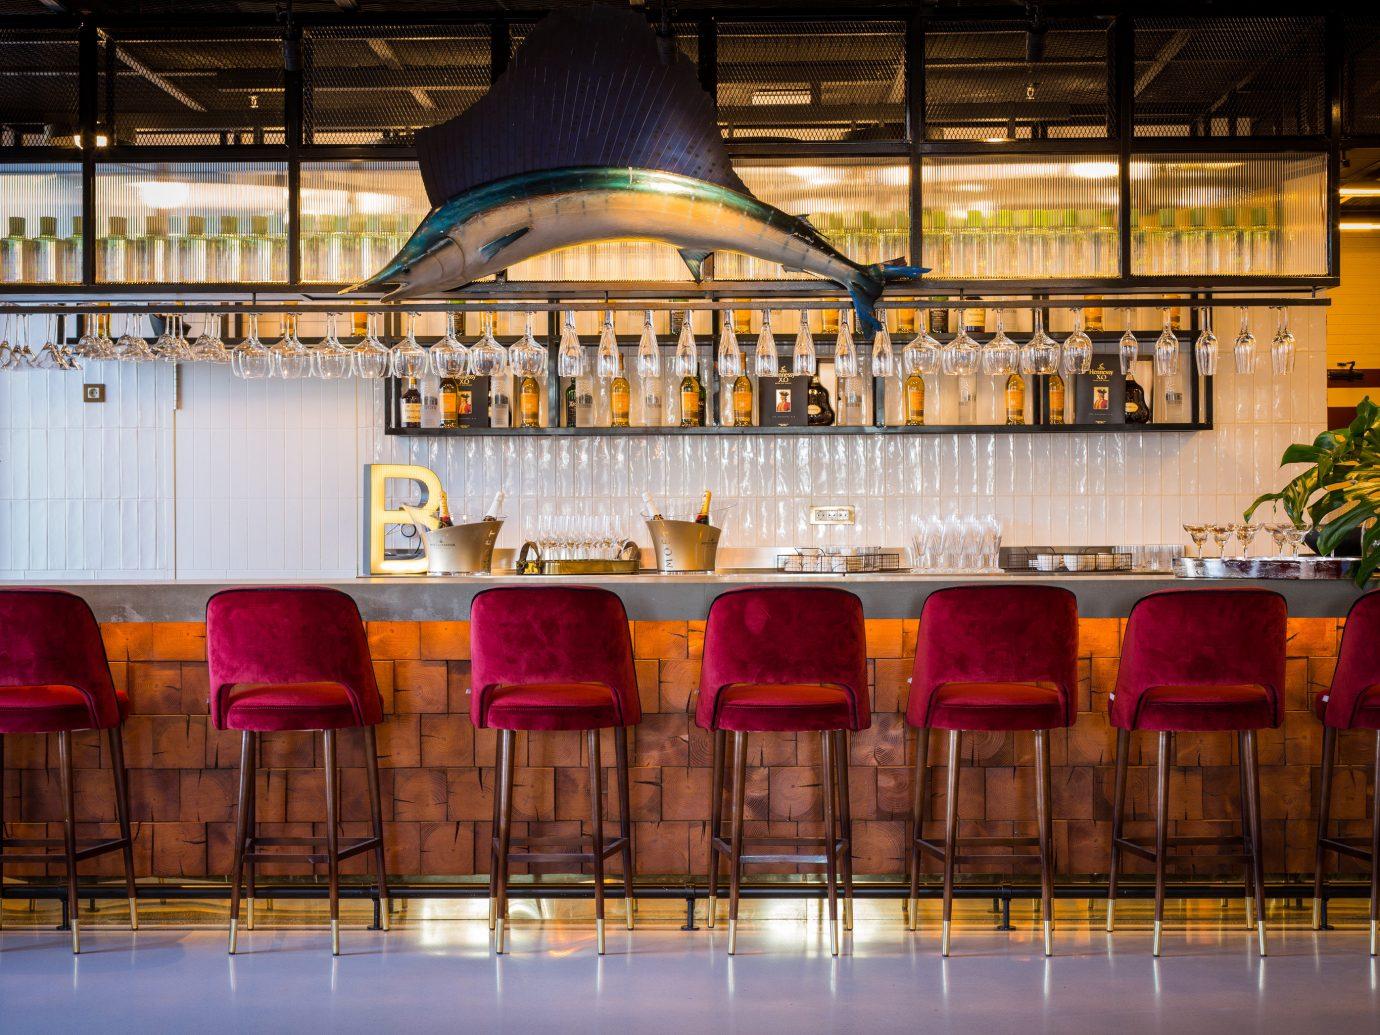 Hotels Madrid Spain indoor restaurant interior design meal Bar